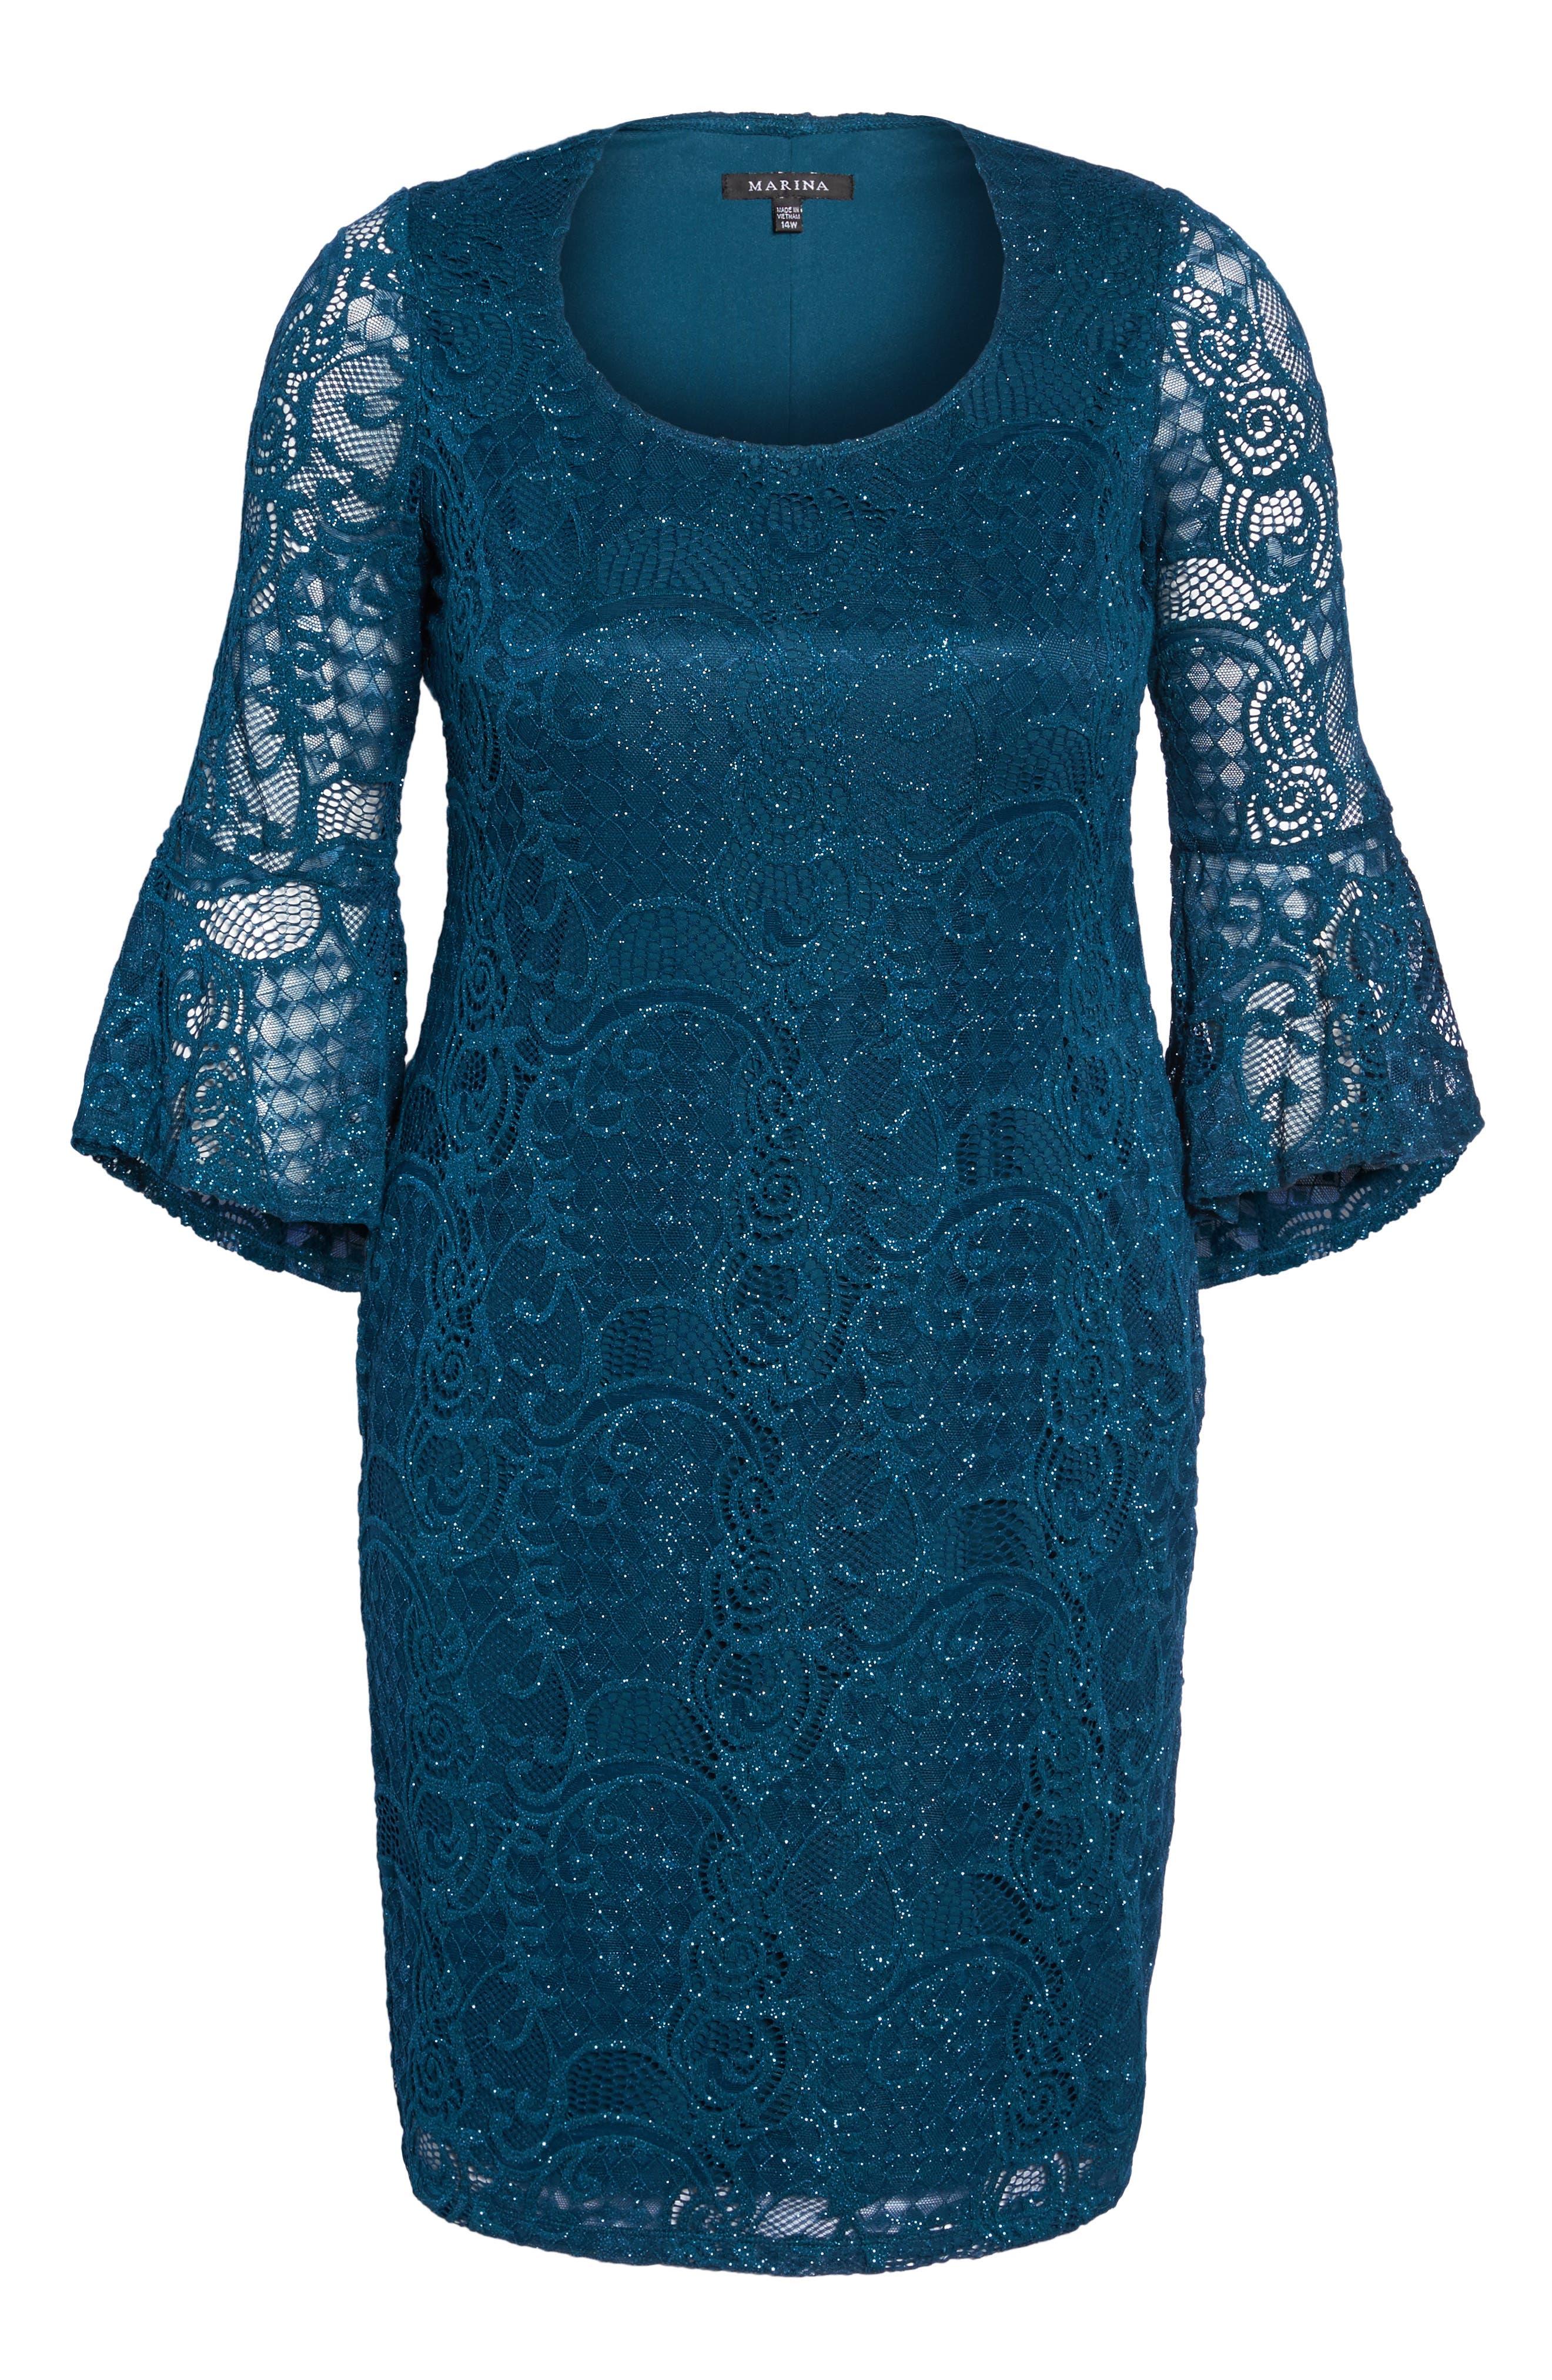 Bell Sleeve Glitter Lace Sheath Dress,                             Alternate thumbnail 6, color,                             412